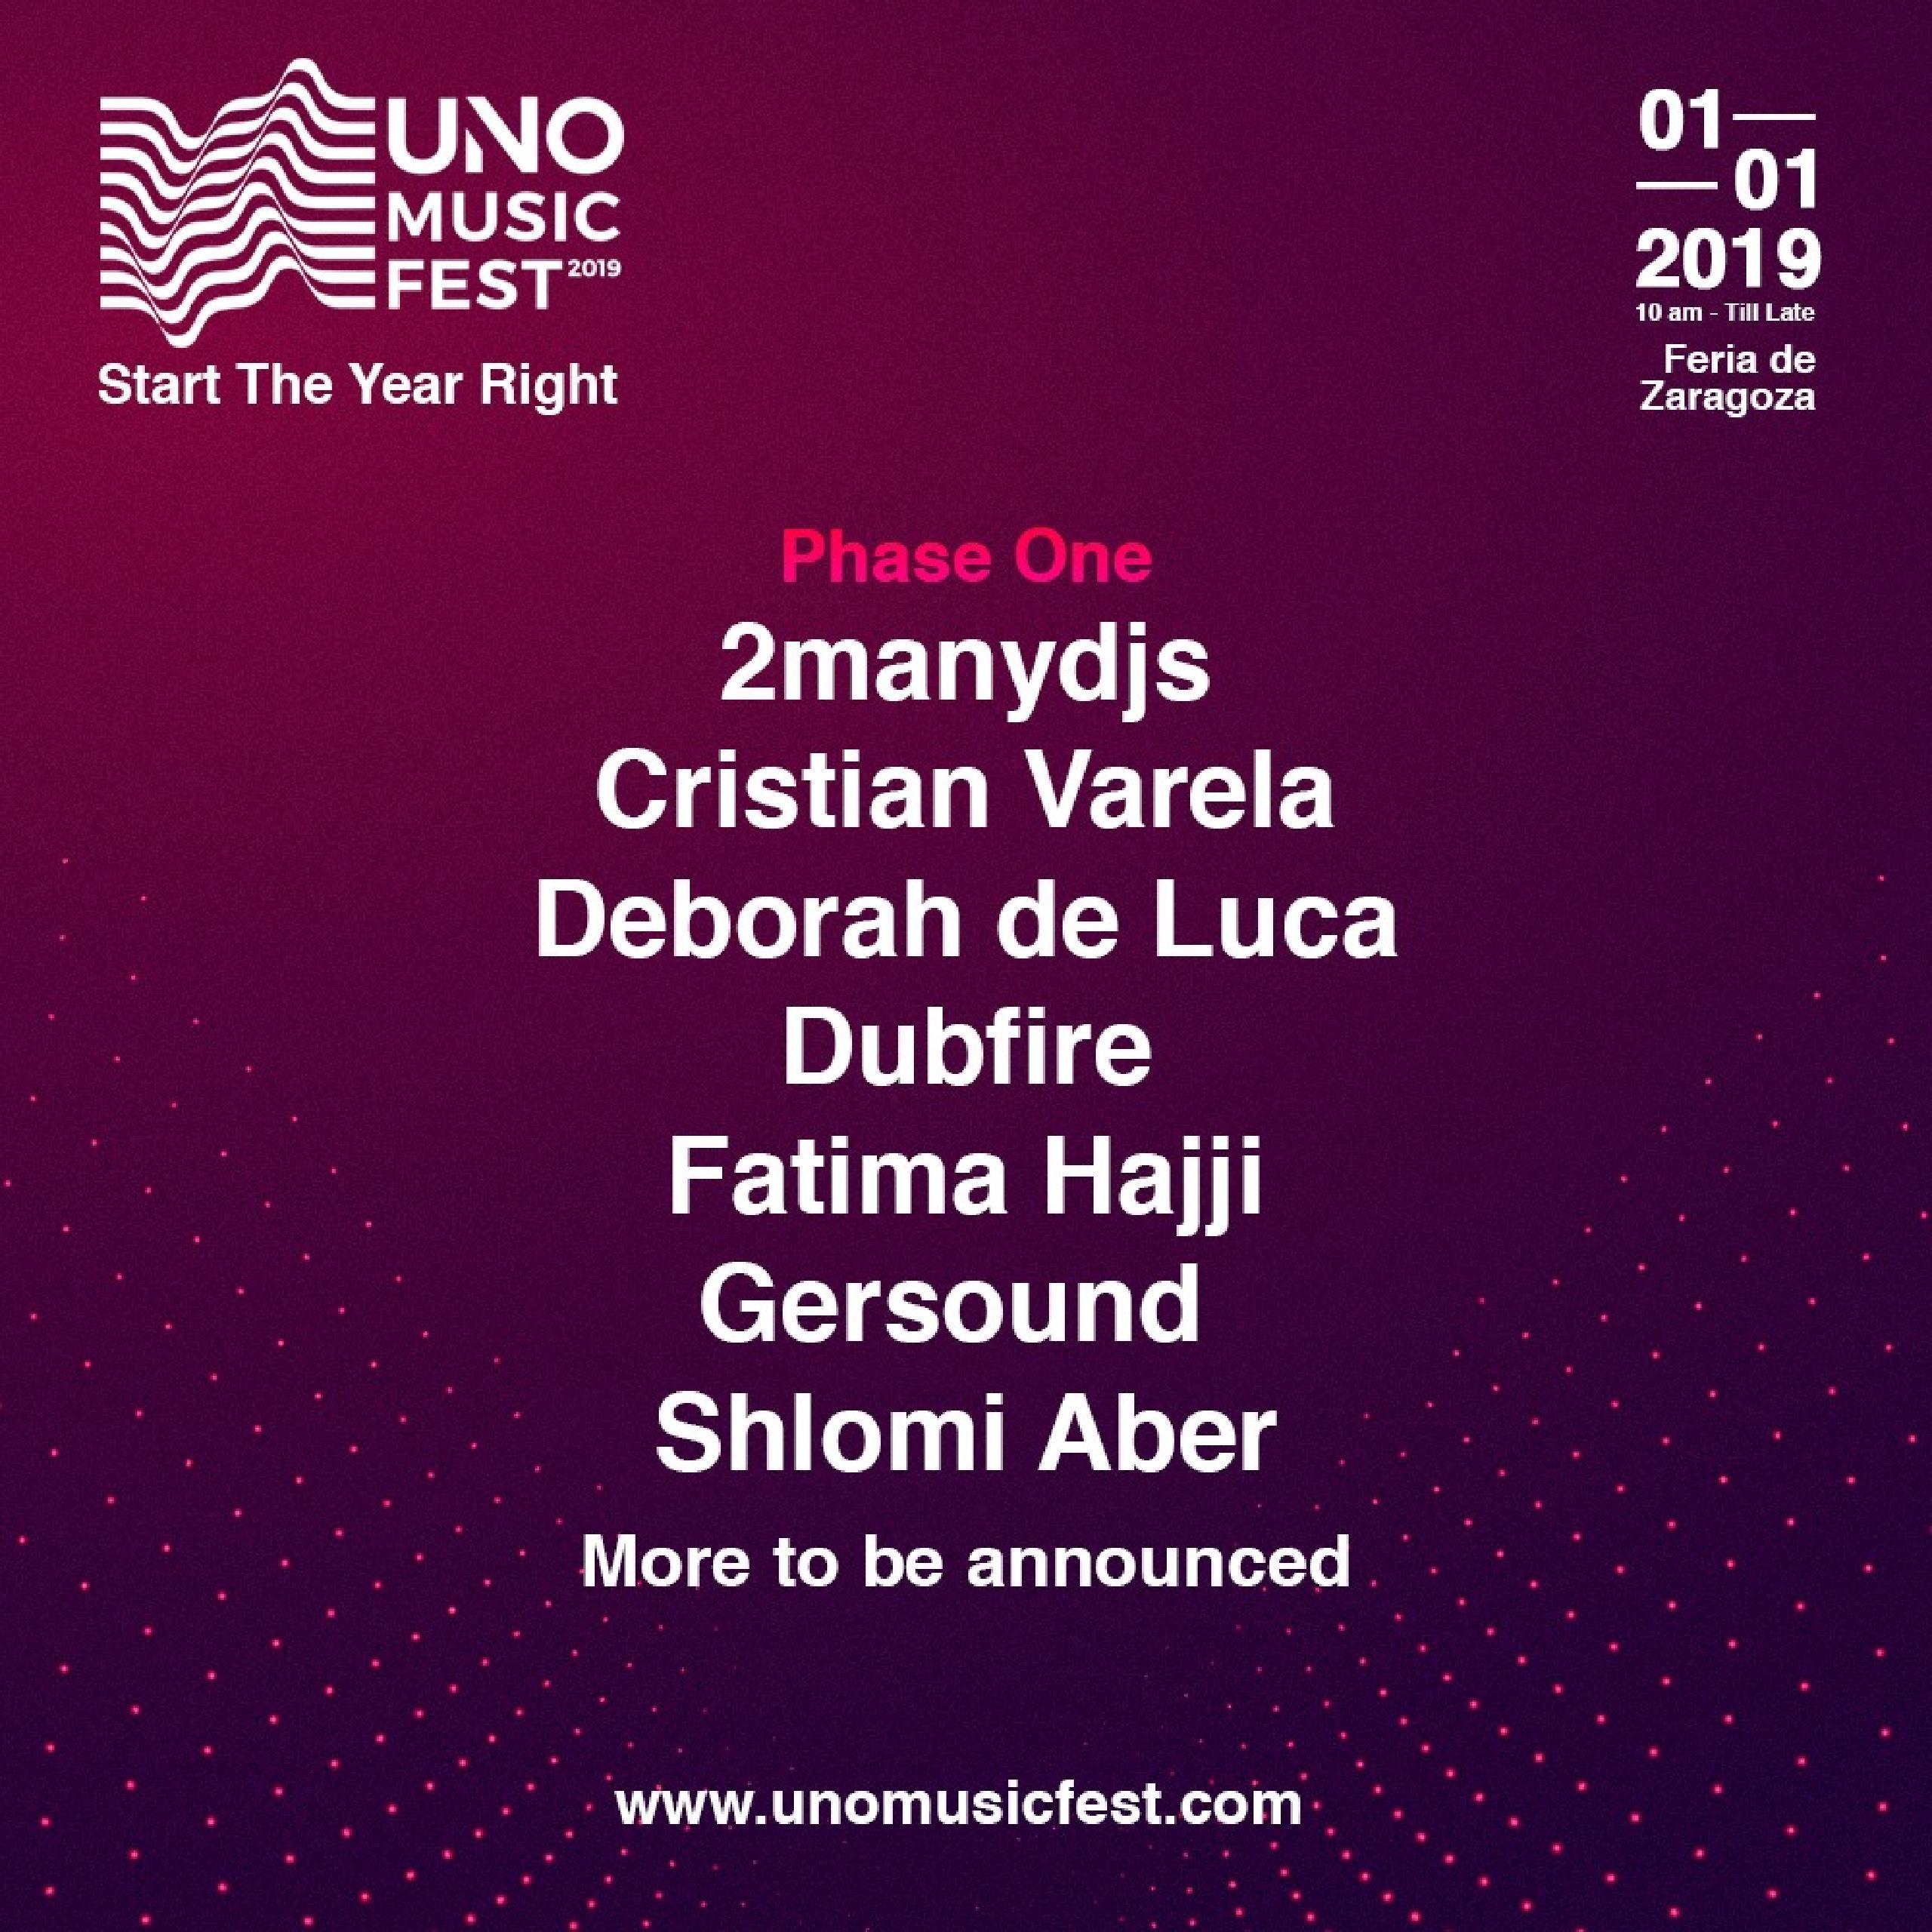 Cartel, confirmaciones, line-up Uno Music Fest 2019